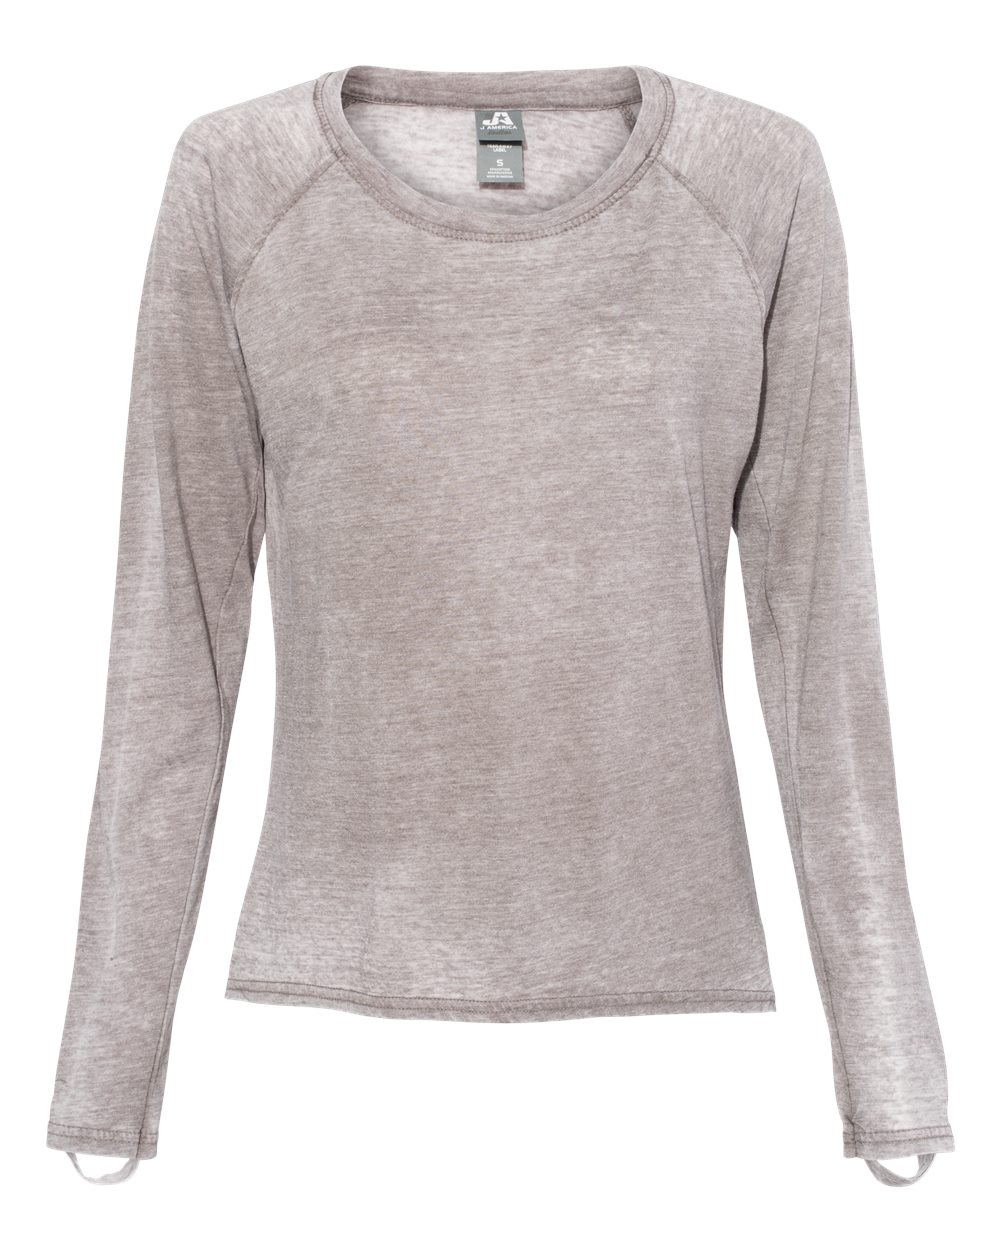 J. America - 8118 - Women's Zen Jersey Hi-Low Long Sleeve T-Shirt